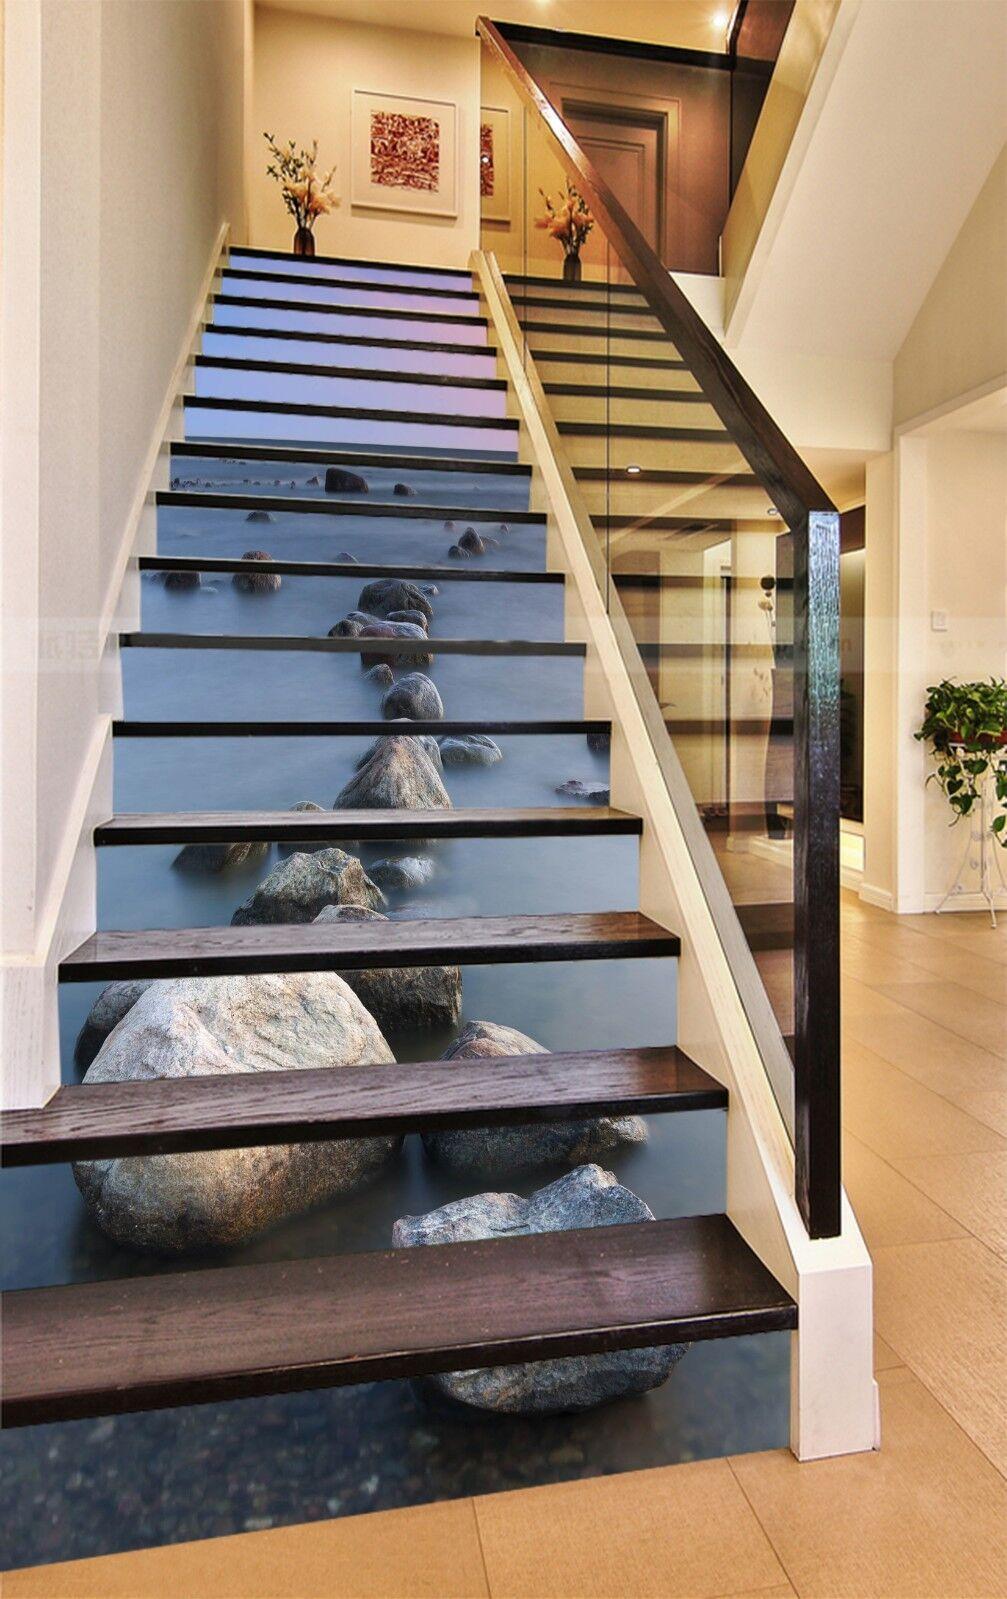 3D Stone River Sky Stair Risers Decoration Photo Mural Vinyl Decal WandPapier CA